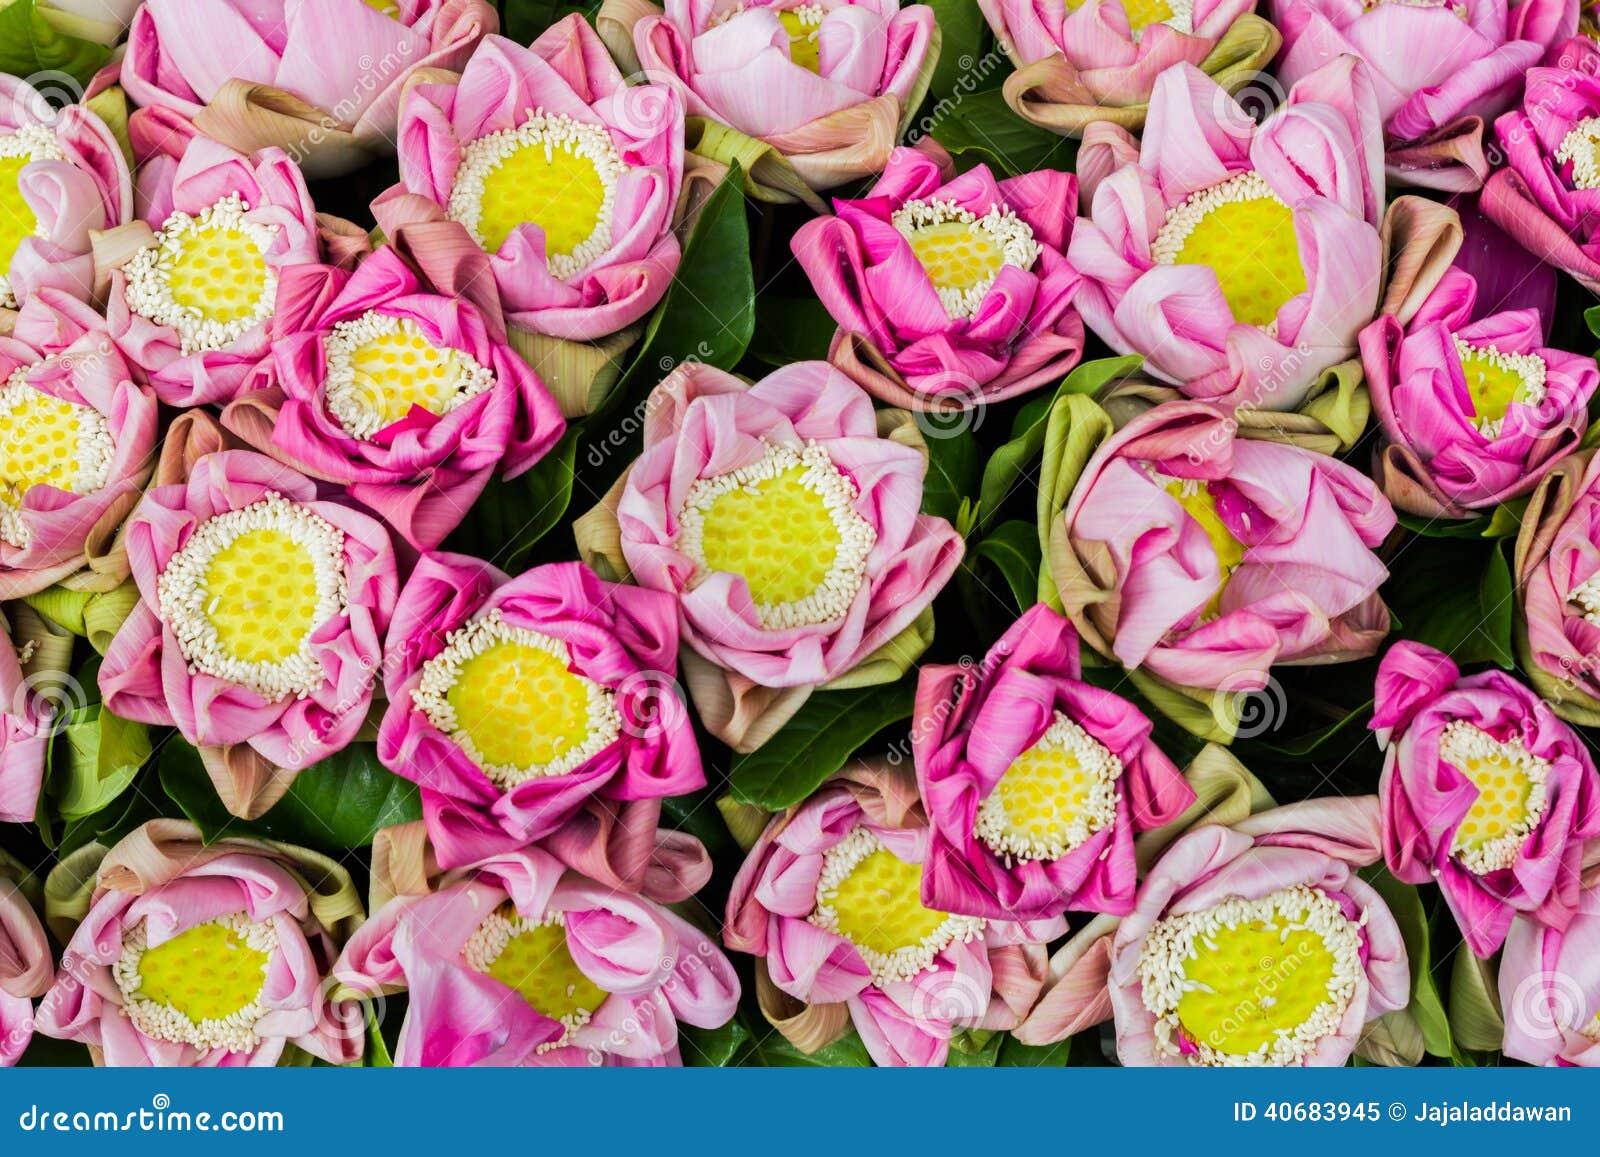 Pink Lotus Flower Arrangement Background Stock Image Image Of